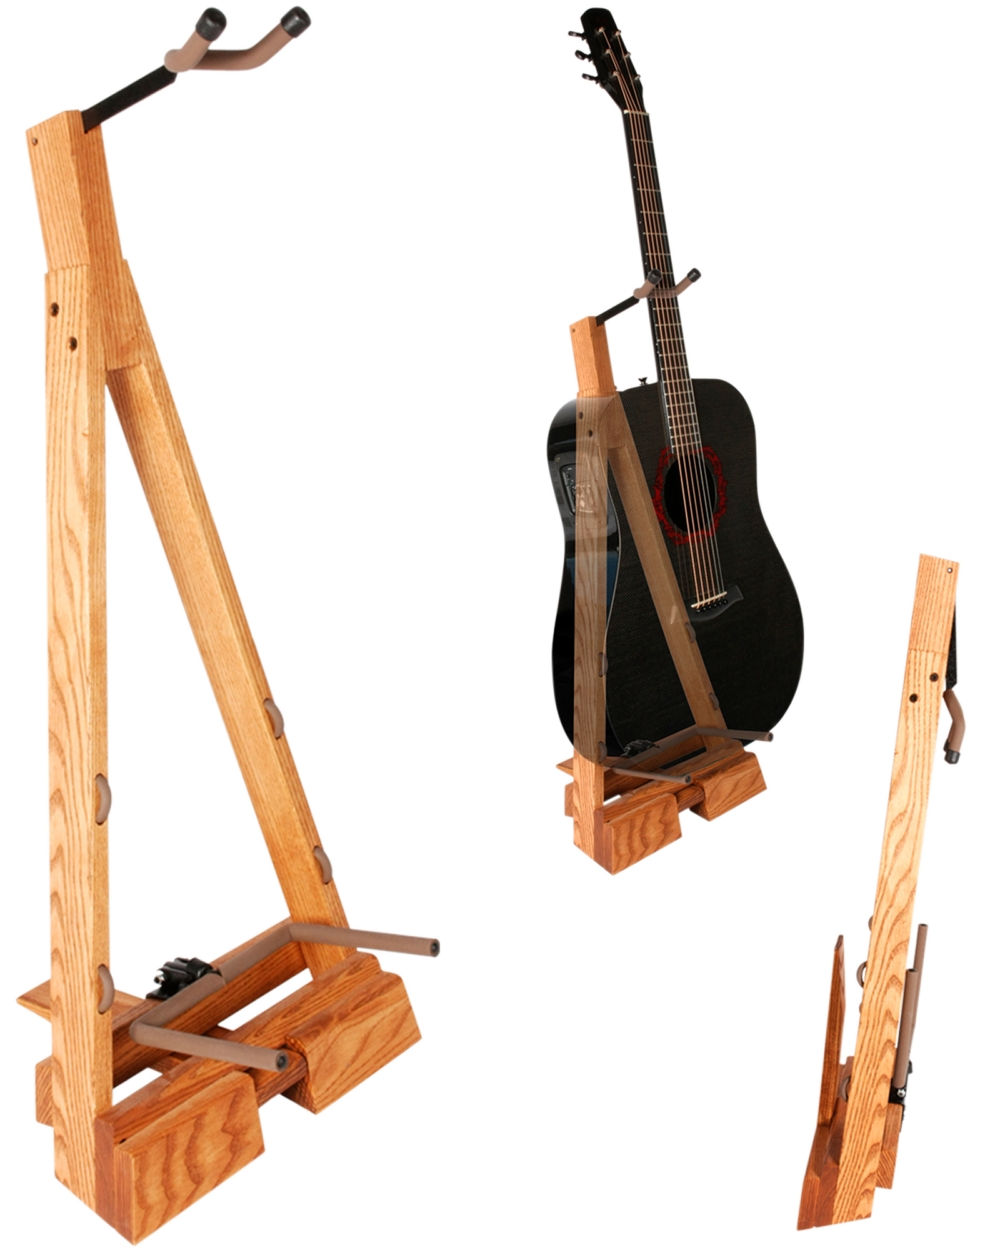 String Swing Guitar Hardwood Floor Stand by String Swing